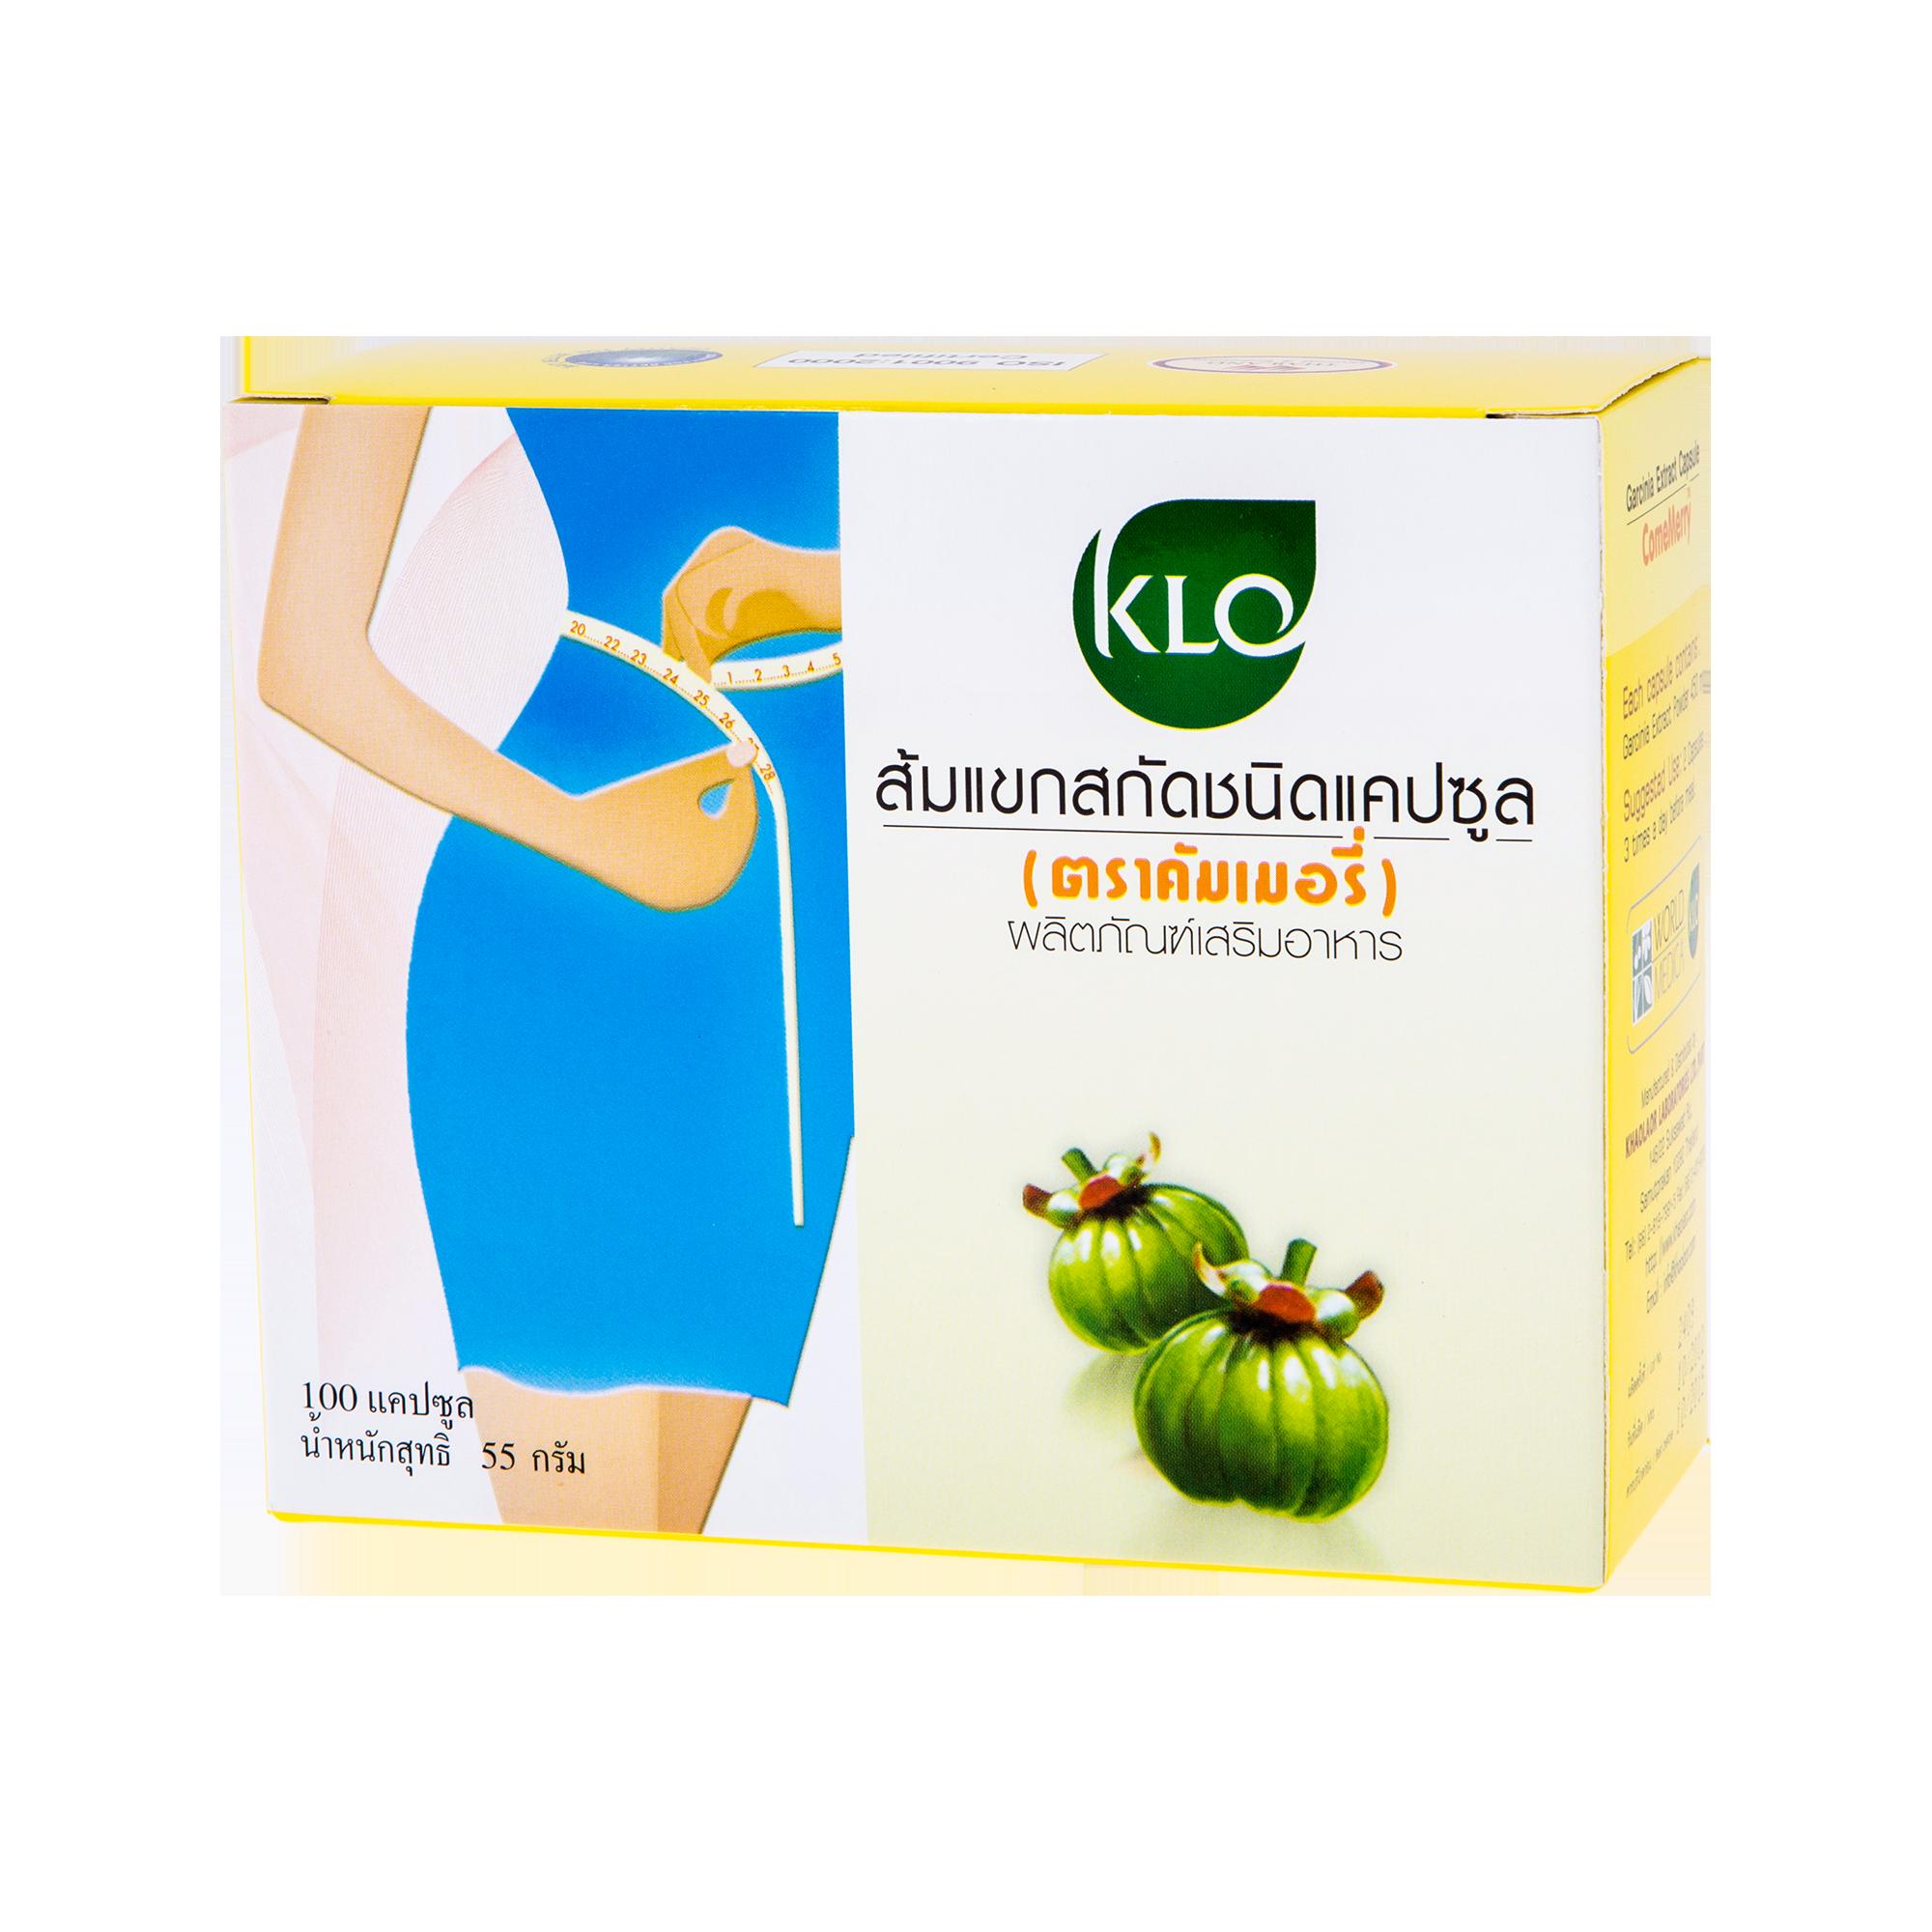 KHAOLAOR ส้มแขก สกัด คัมเมอรี่ (หุ่นดี อย่างมีระบบ)